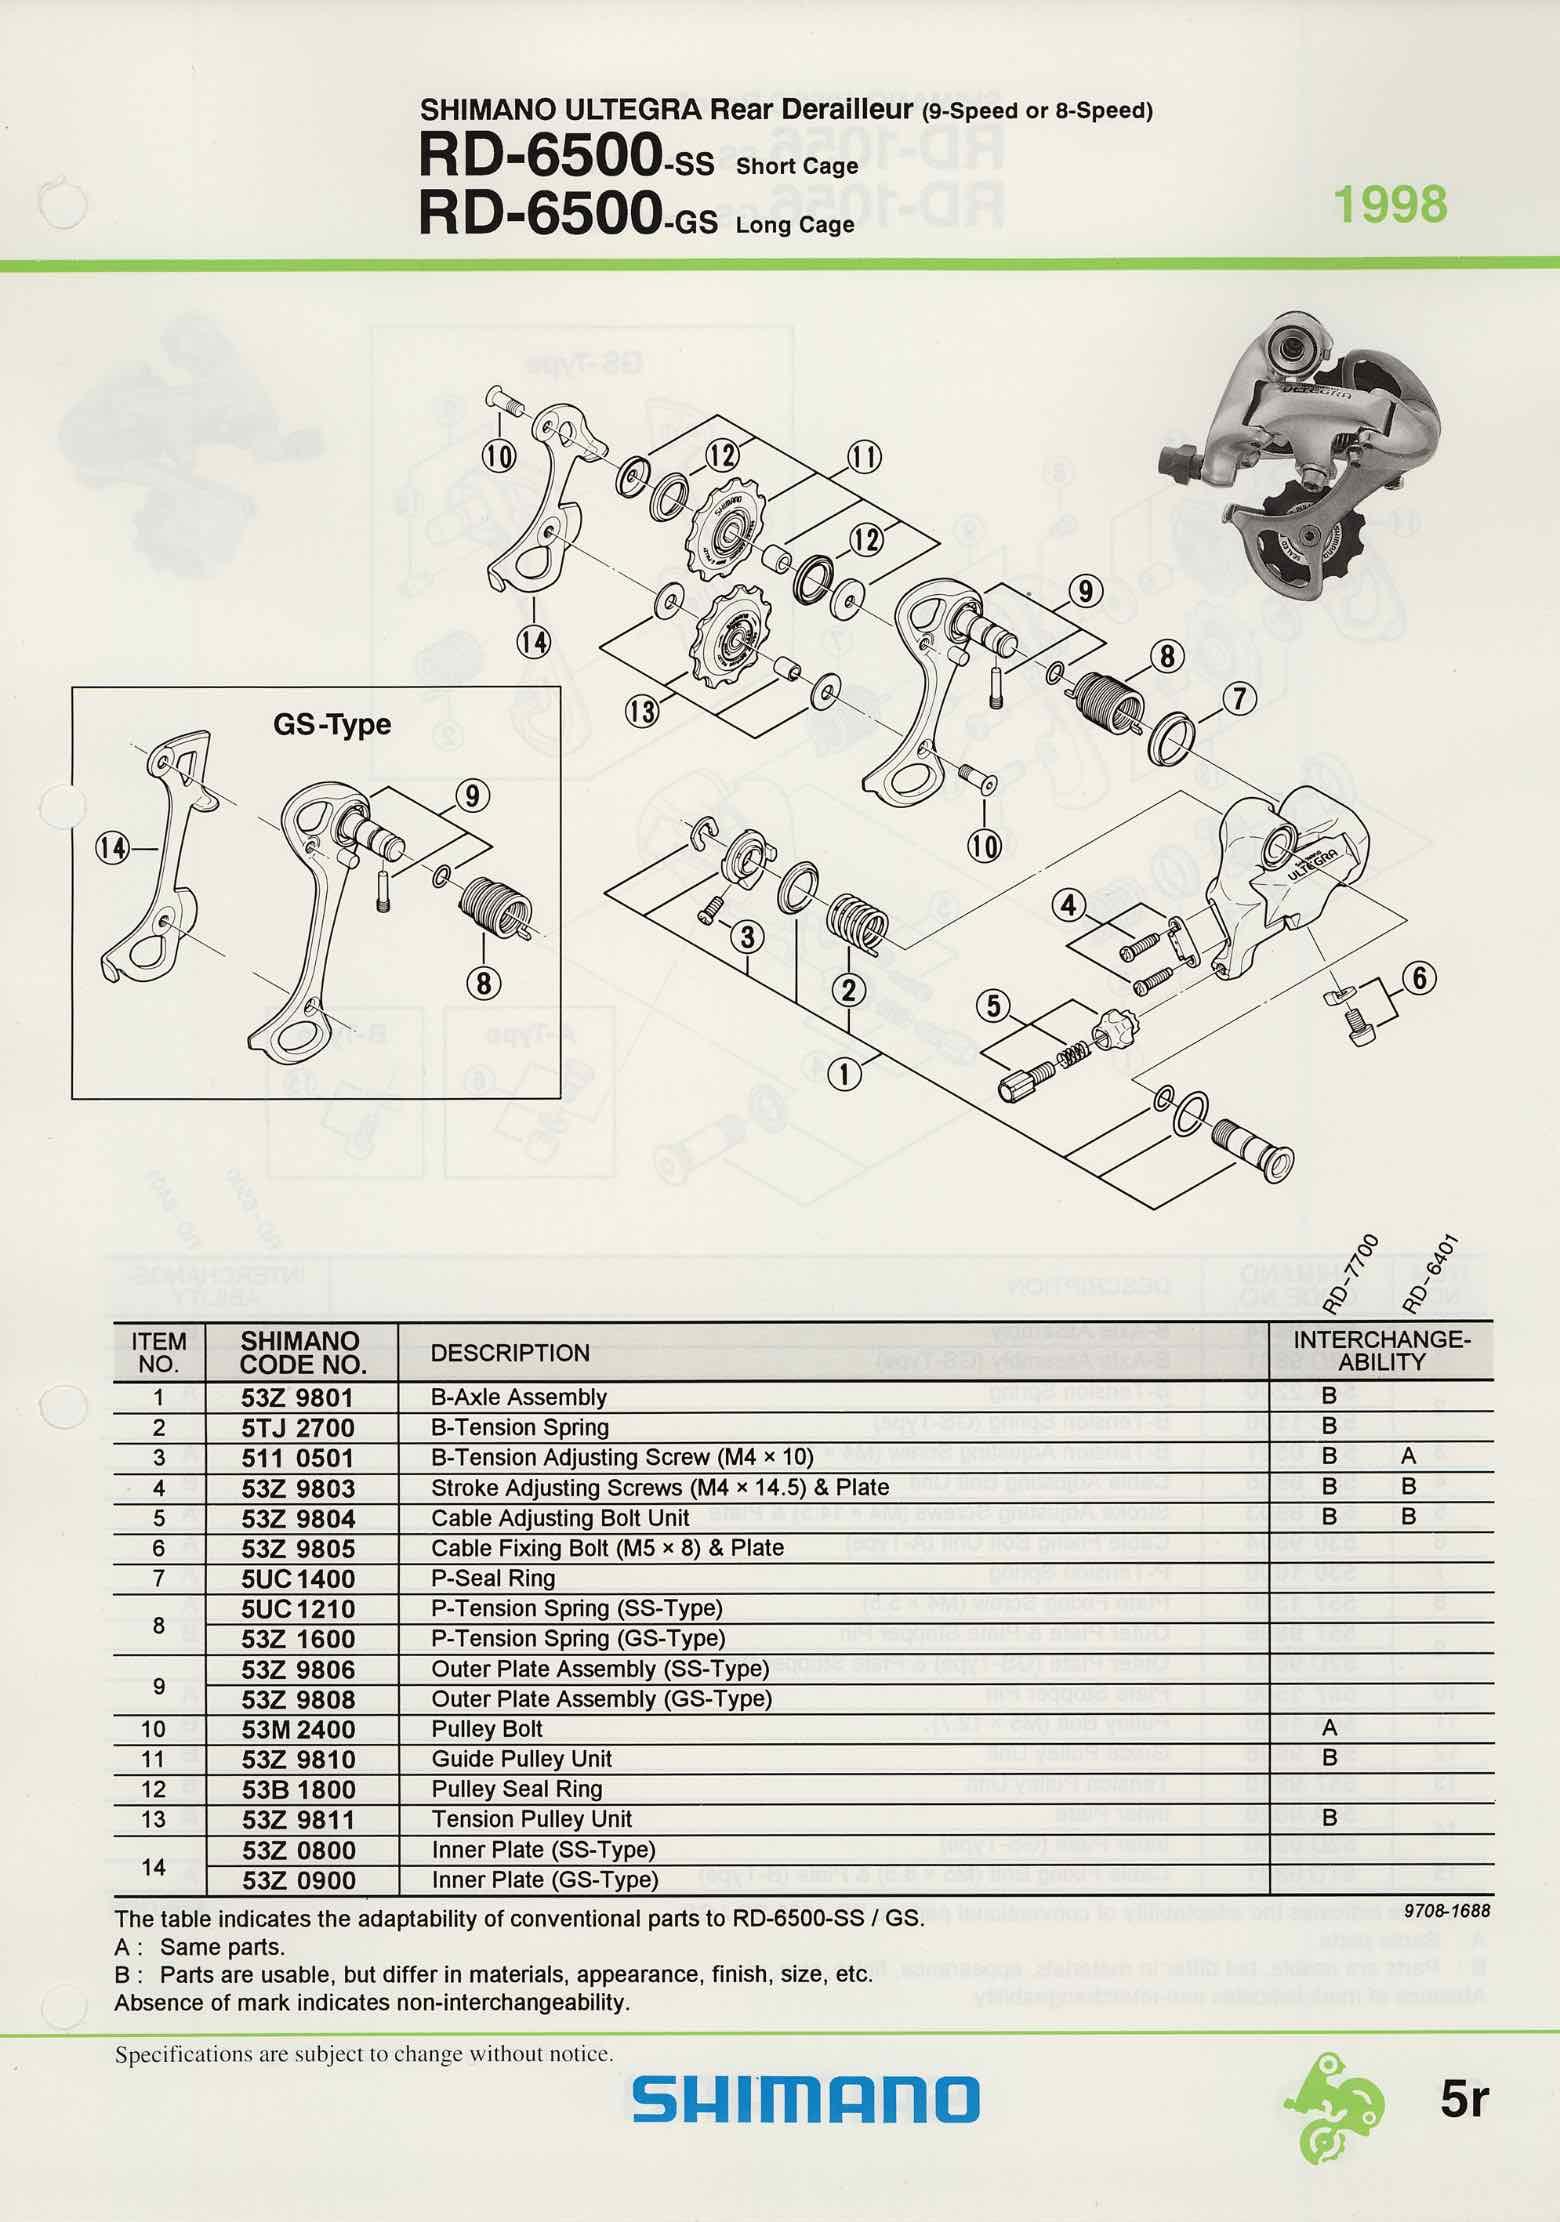 Shimano Spare Parts Catalogue - 1994 to 2004